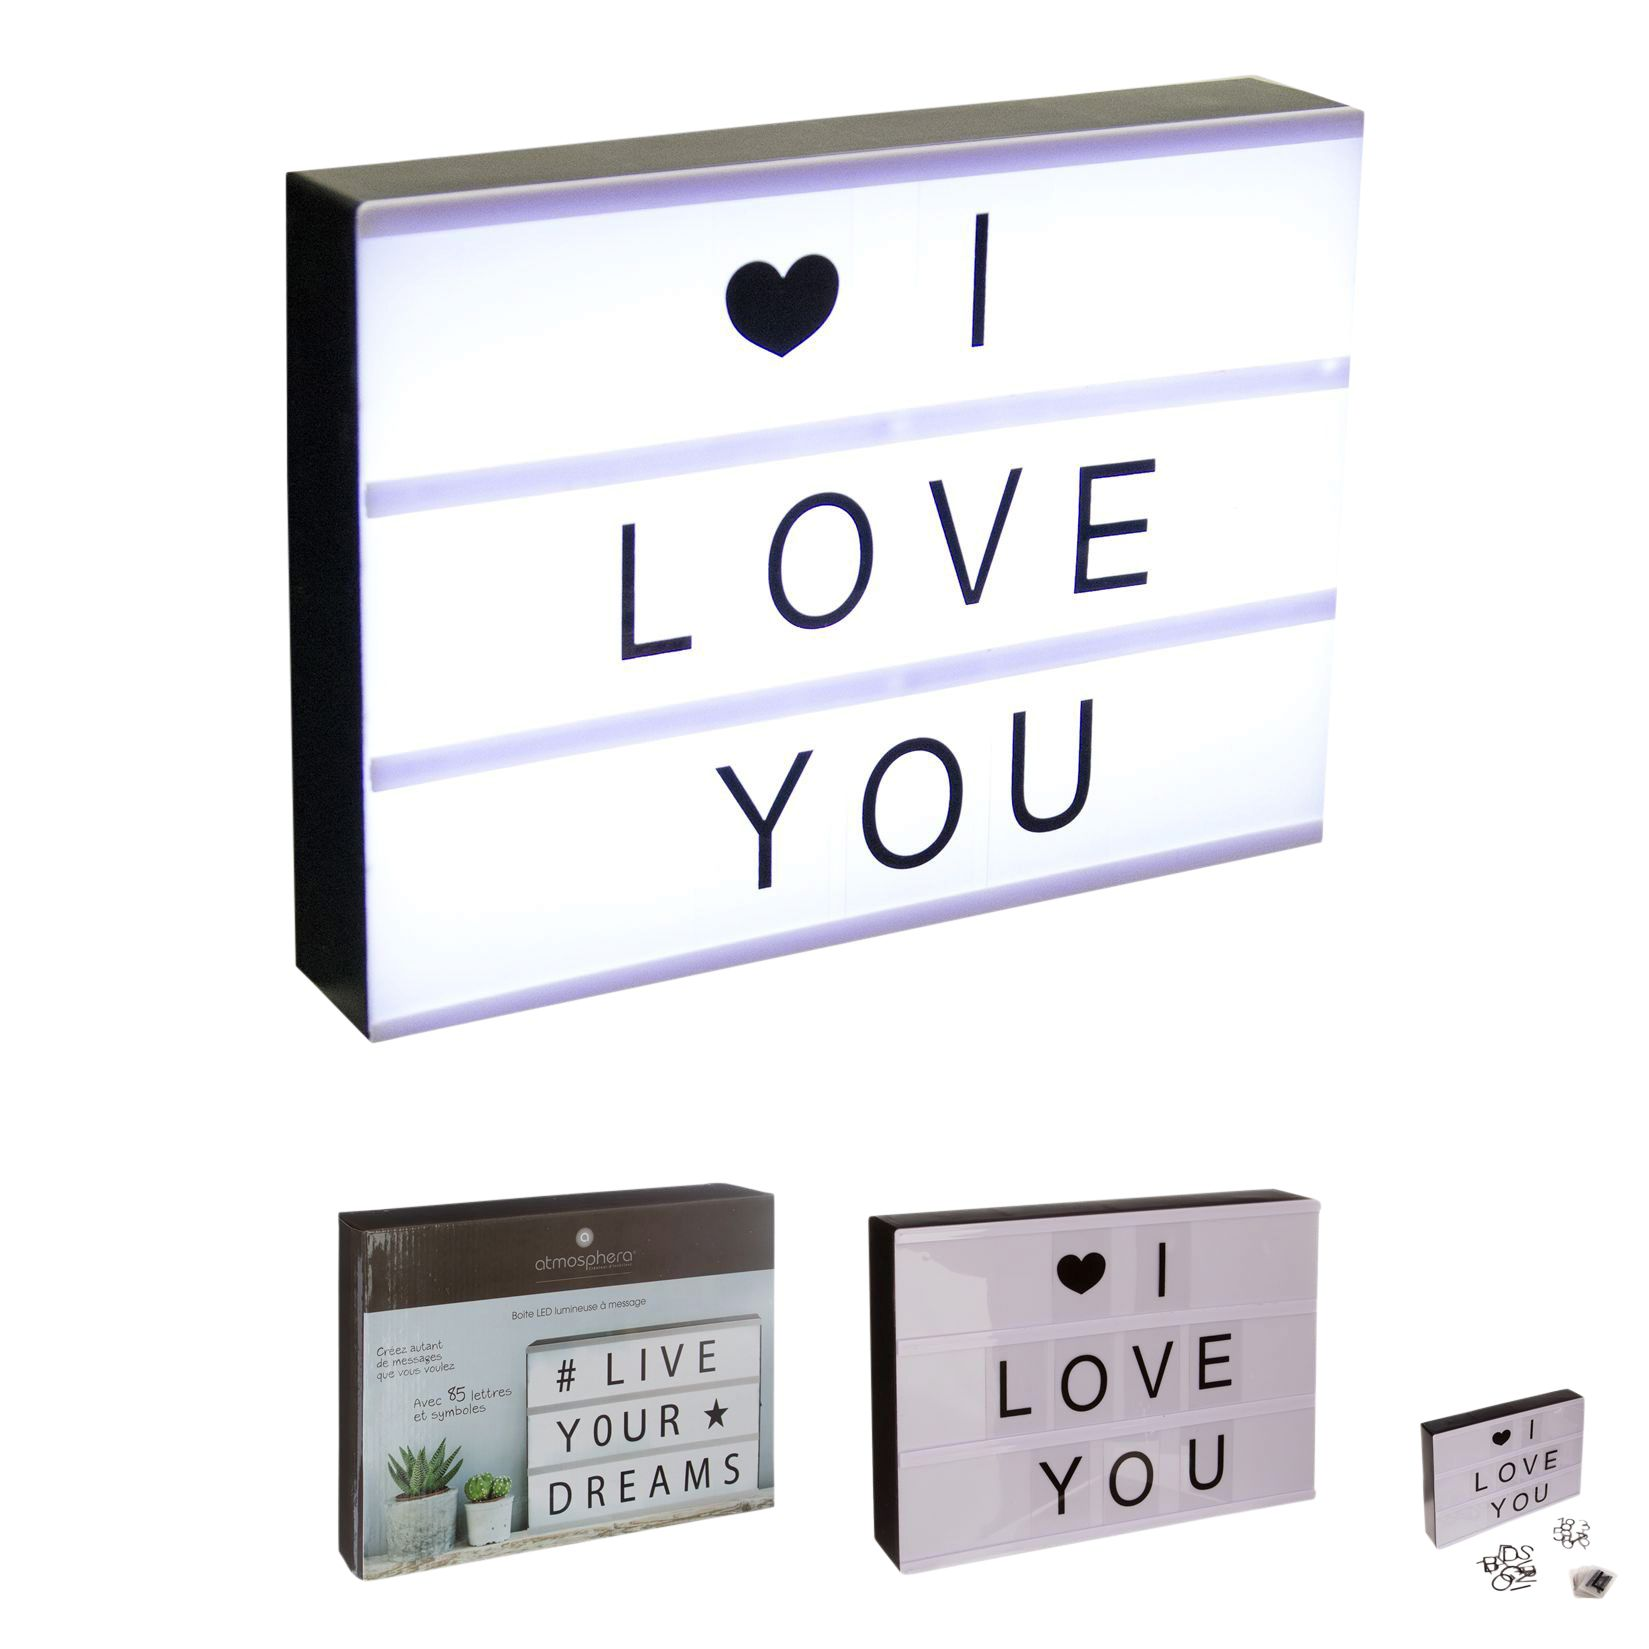 objet lumineux boite lumineuse blanc noir boite lumineuse petit mot et boite. Black Bedroom Furniture Sets. Home Design Ideas